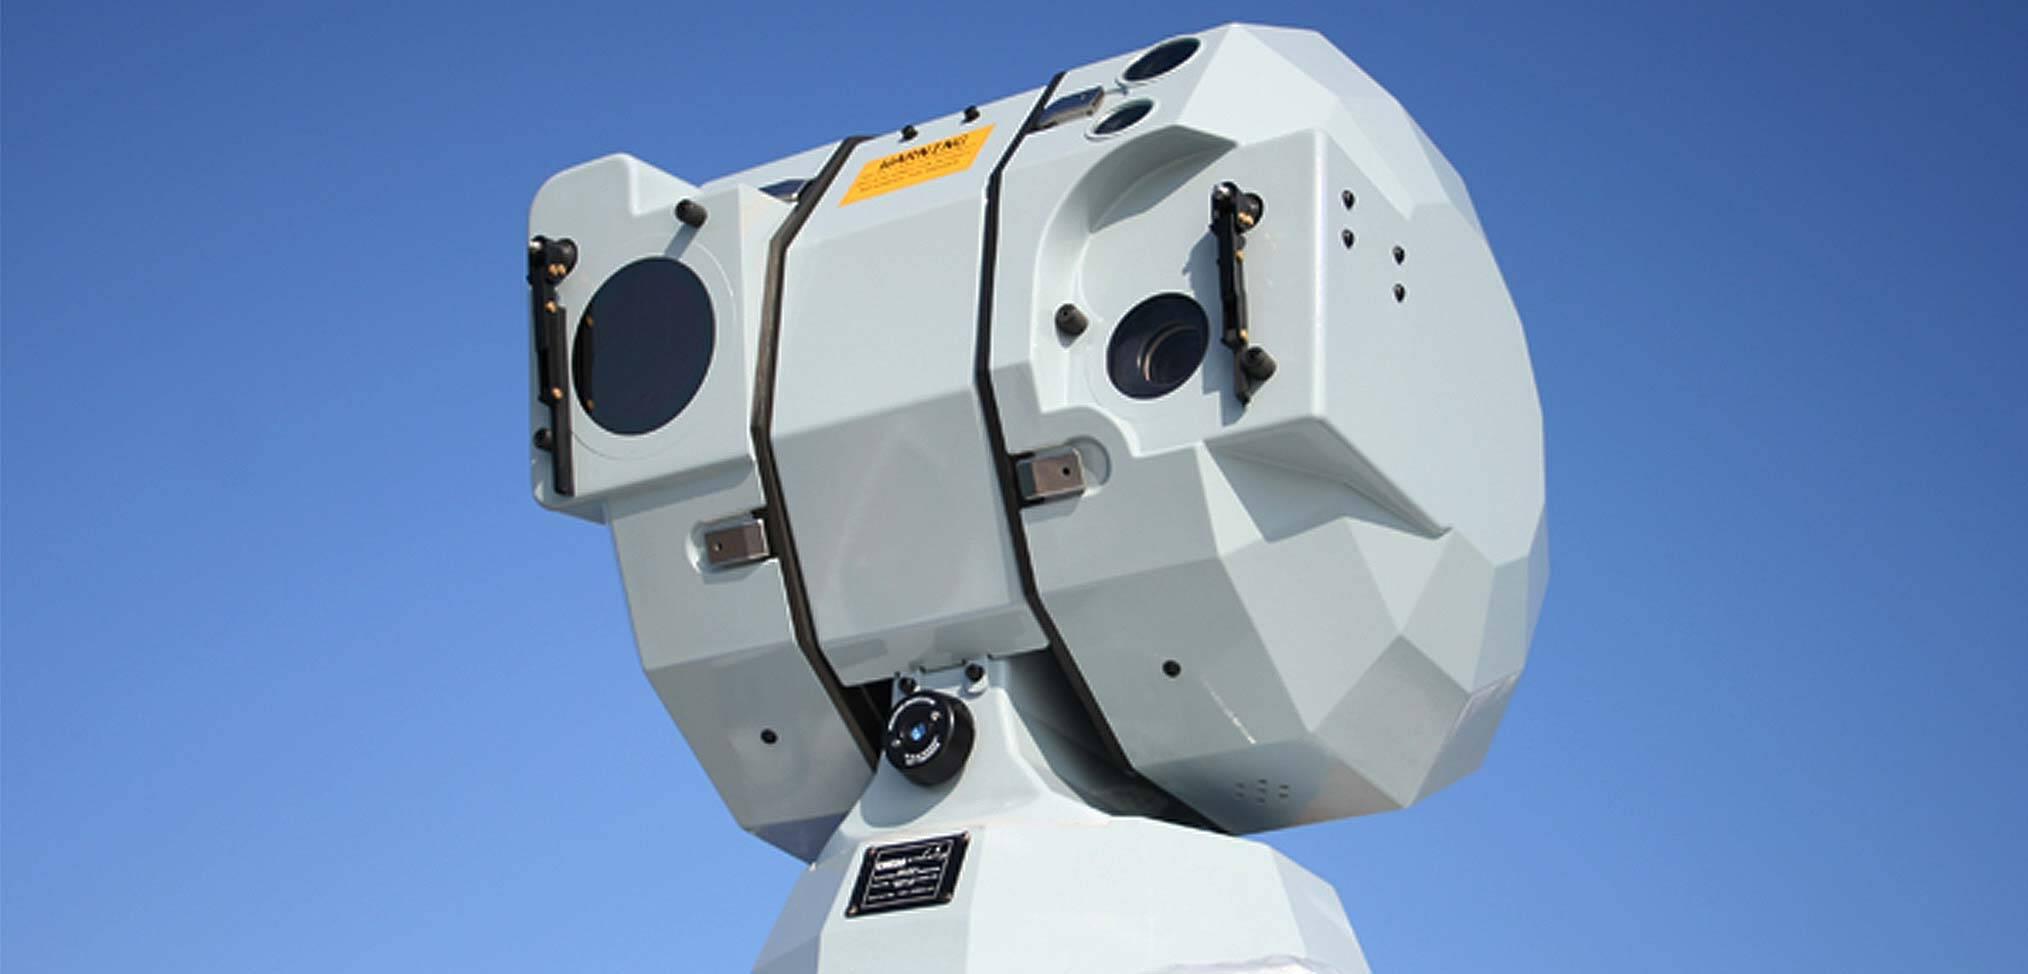 The electro-optical director – eyes of the Royal Navy fleet